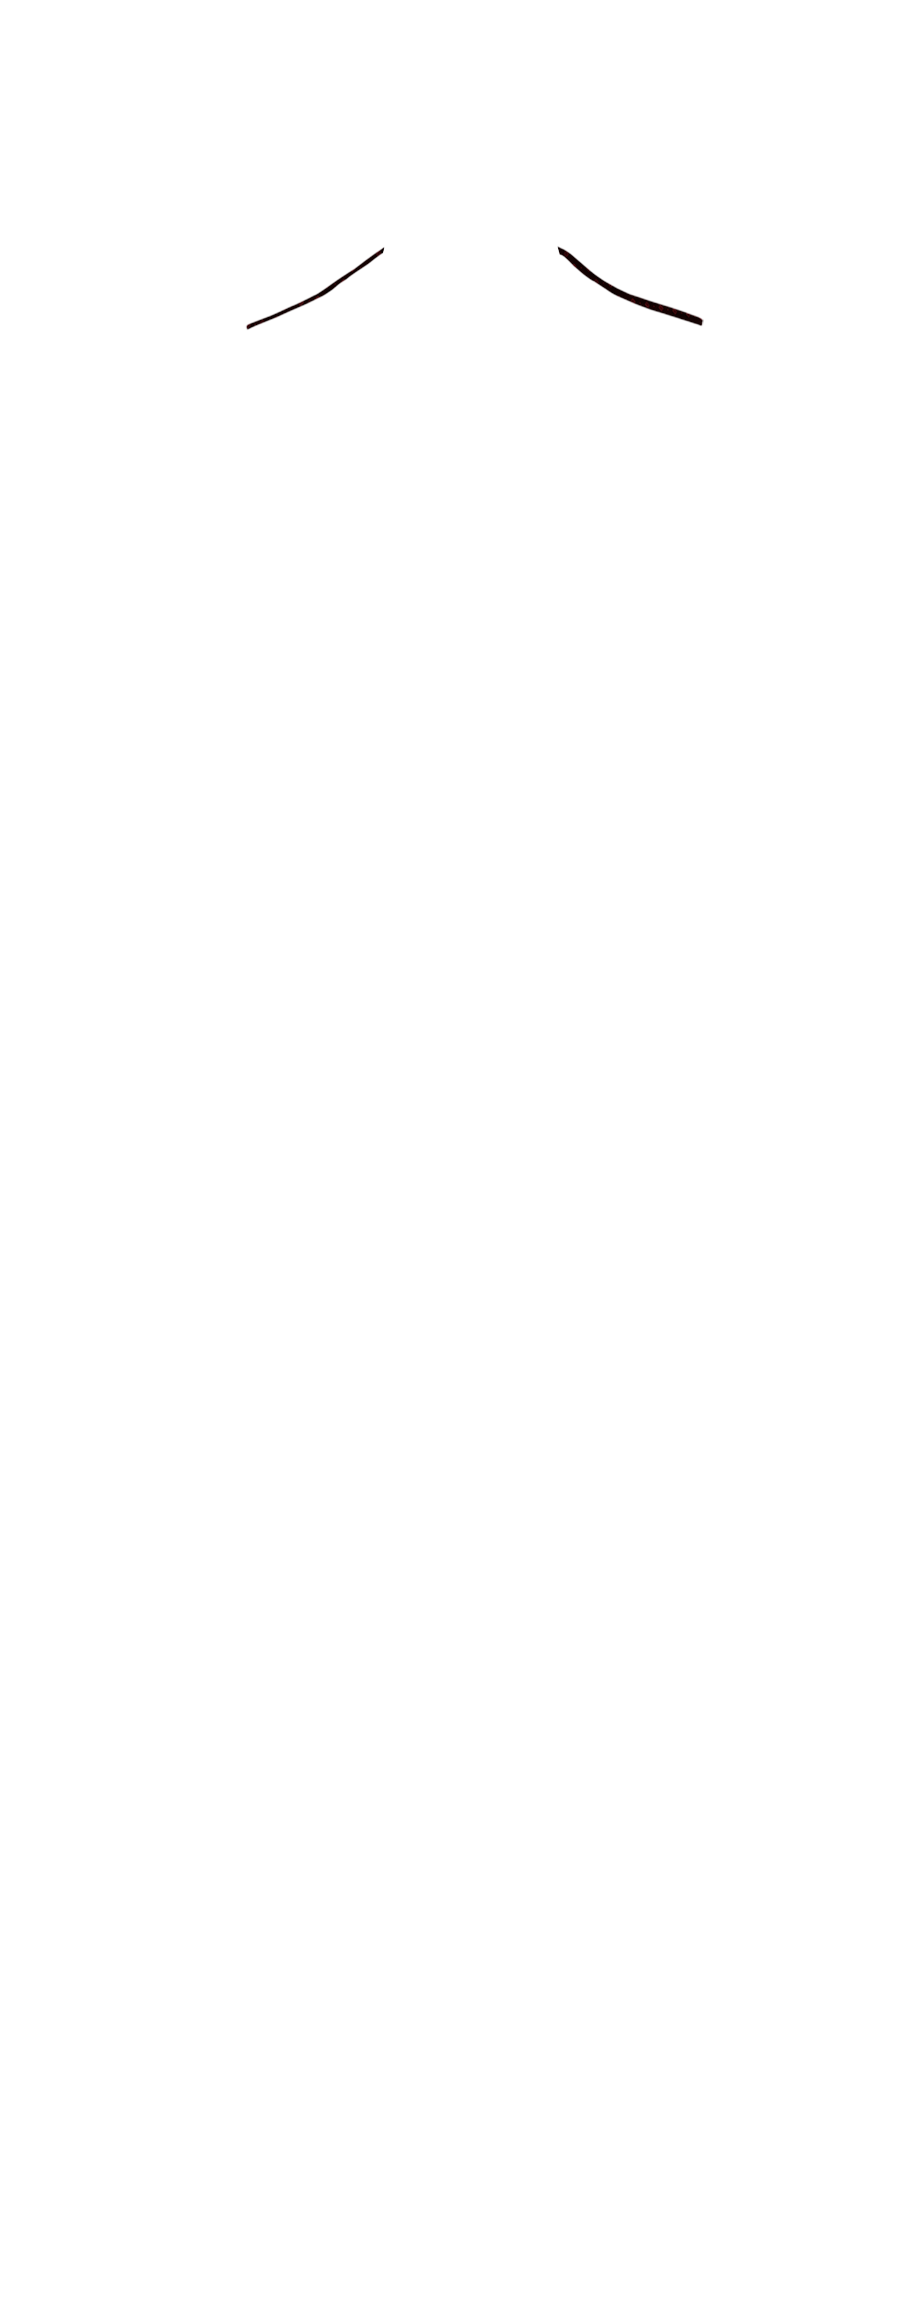 NEFL-13